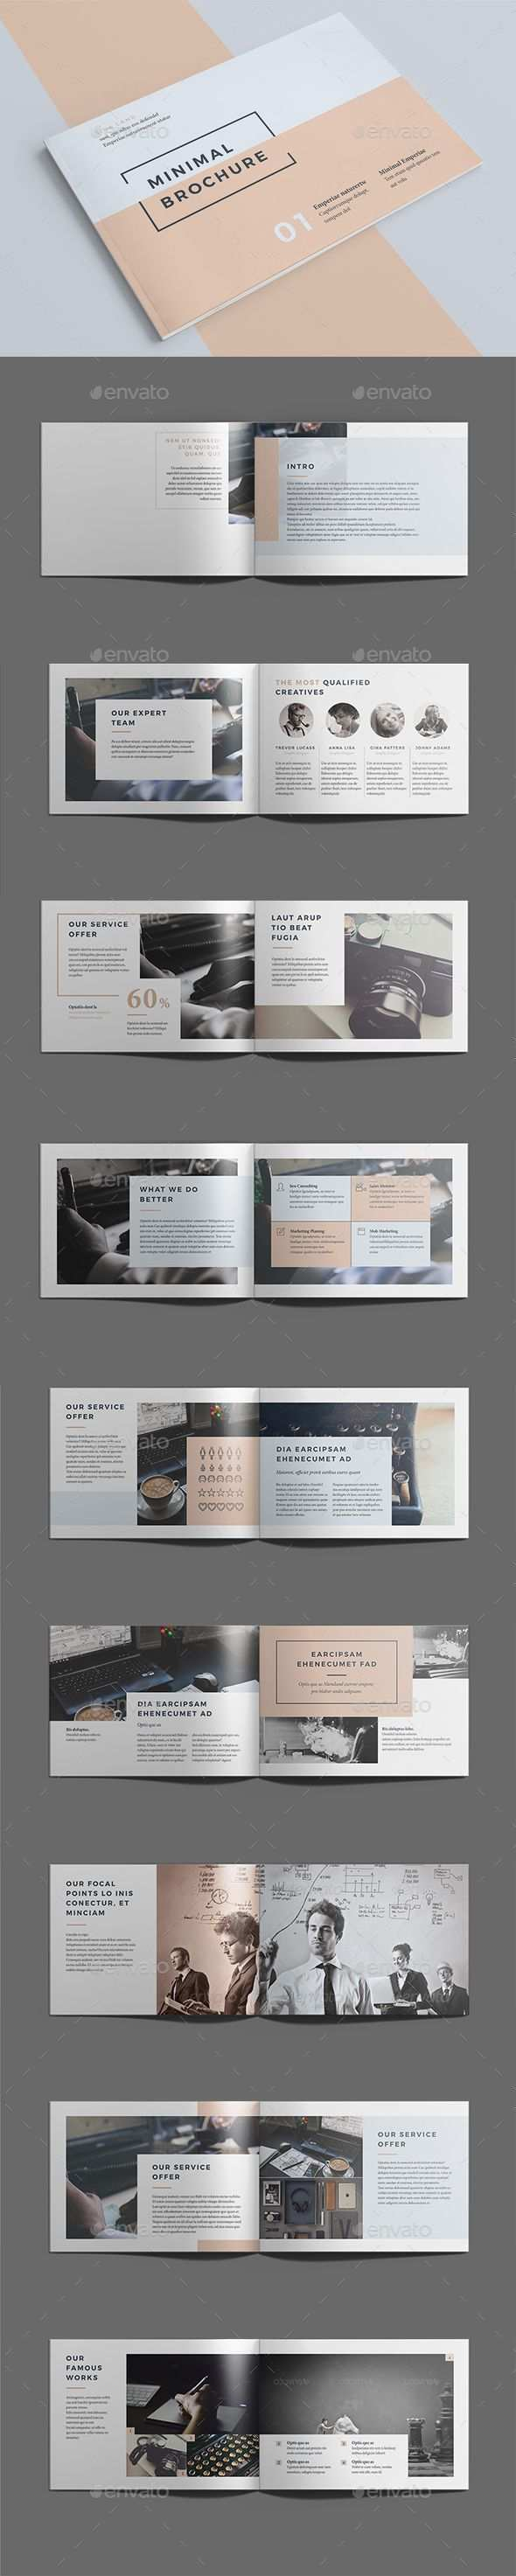 Minimal Brochure Template Indesign Indd Download Here Https